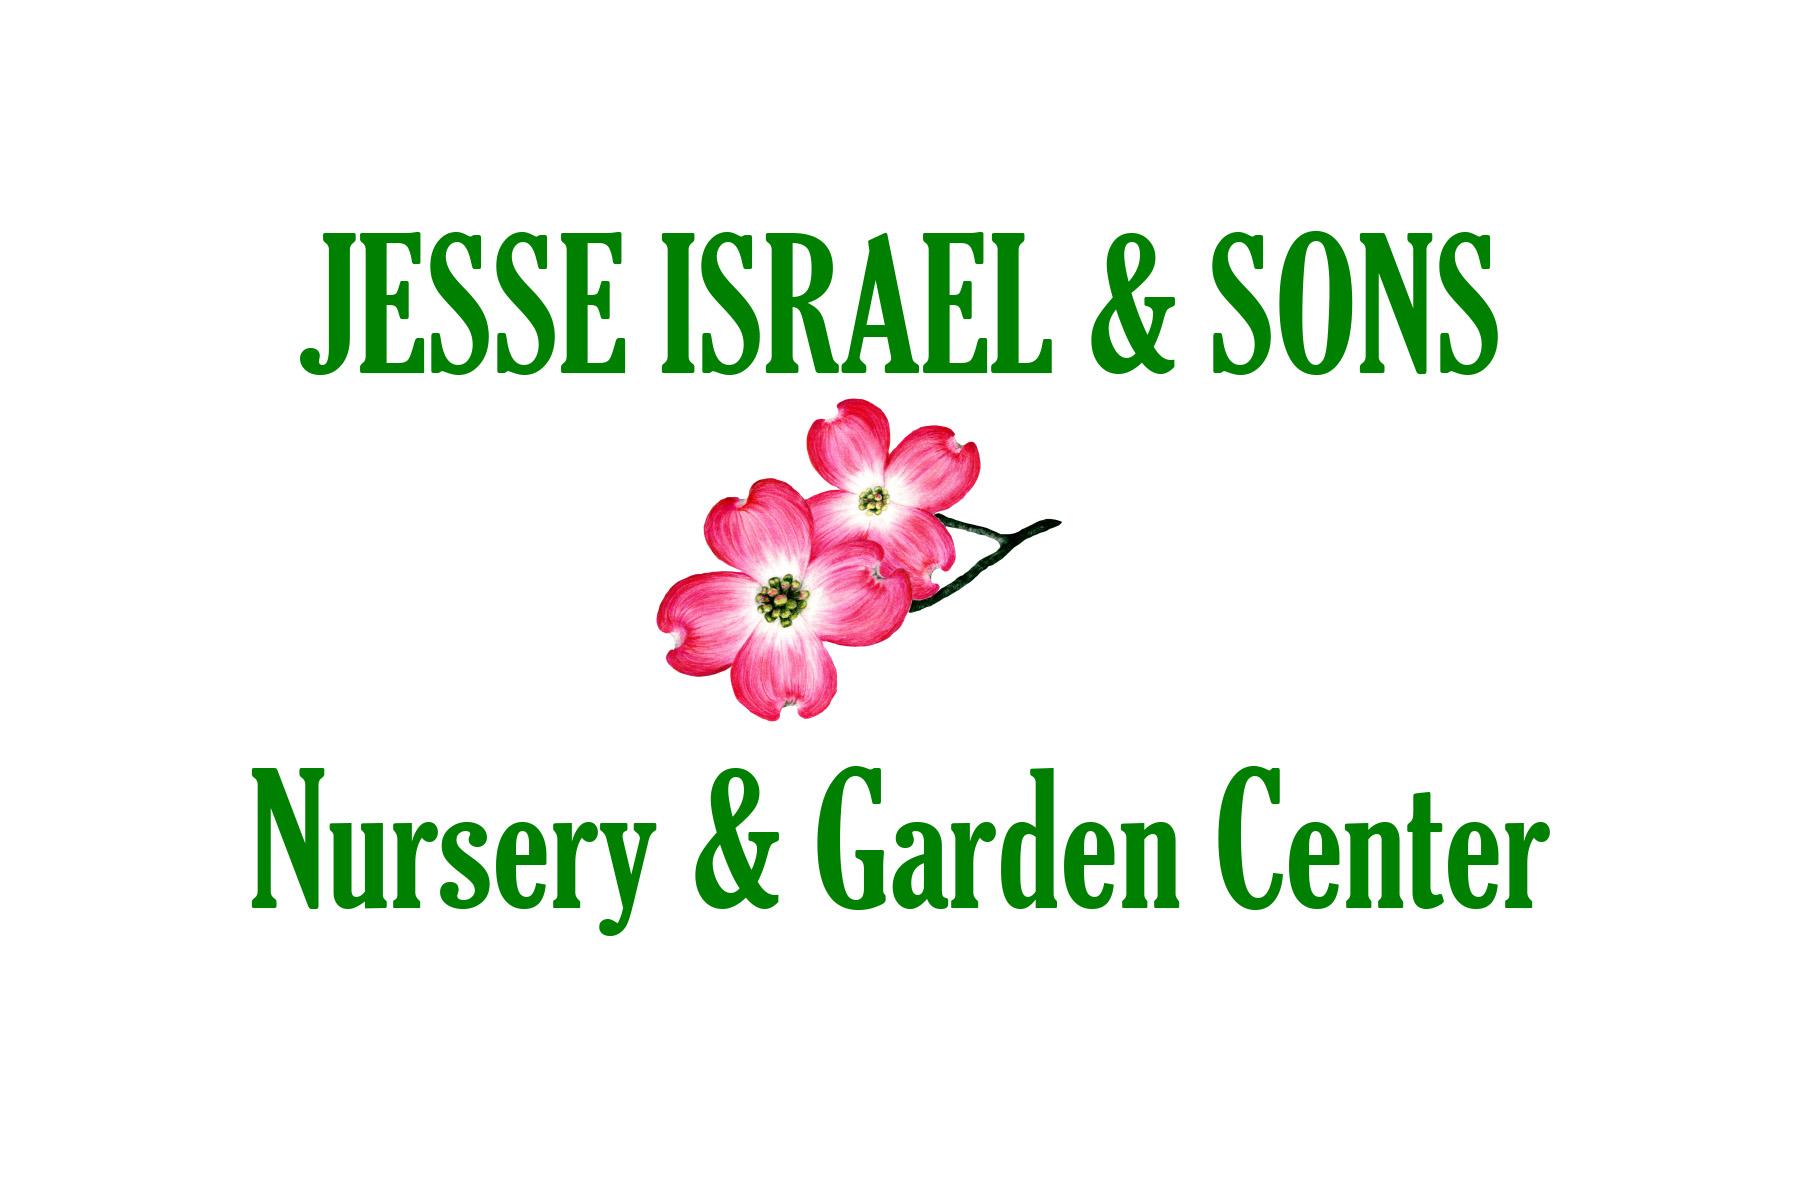 Jesse Israel & Sons